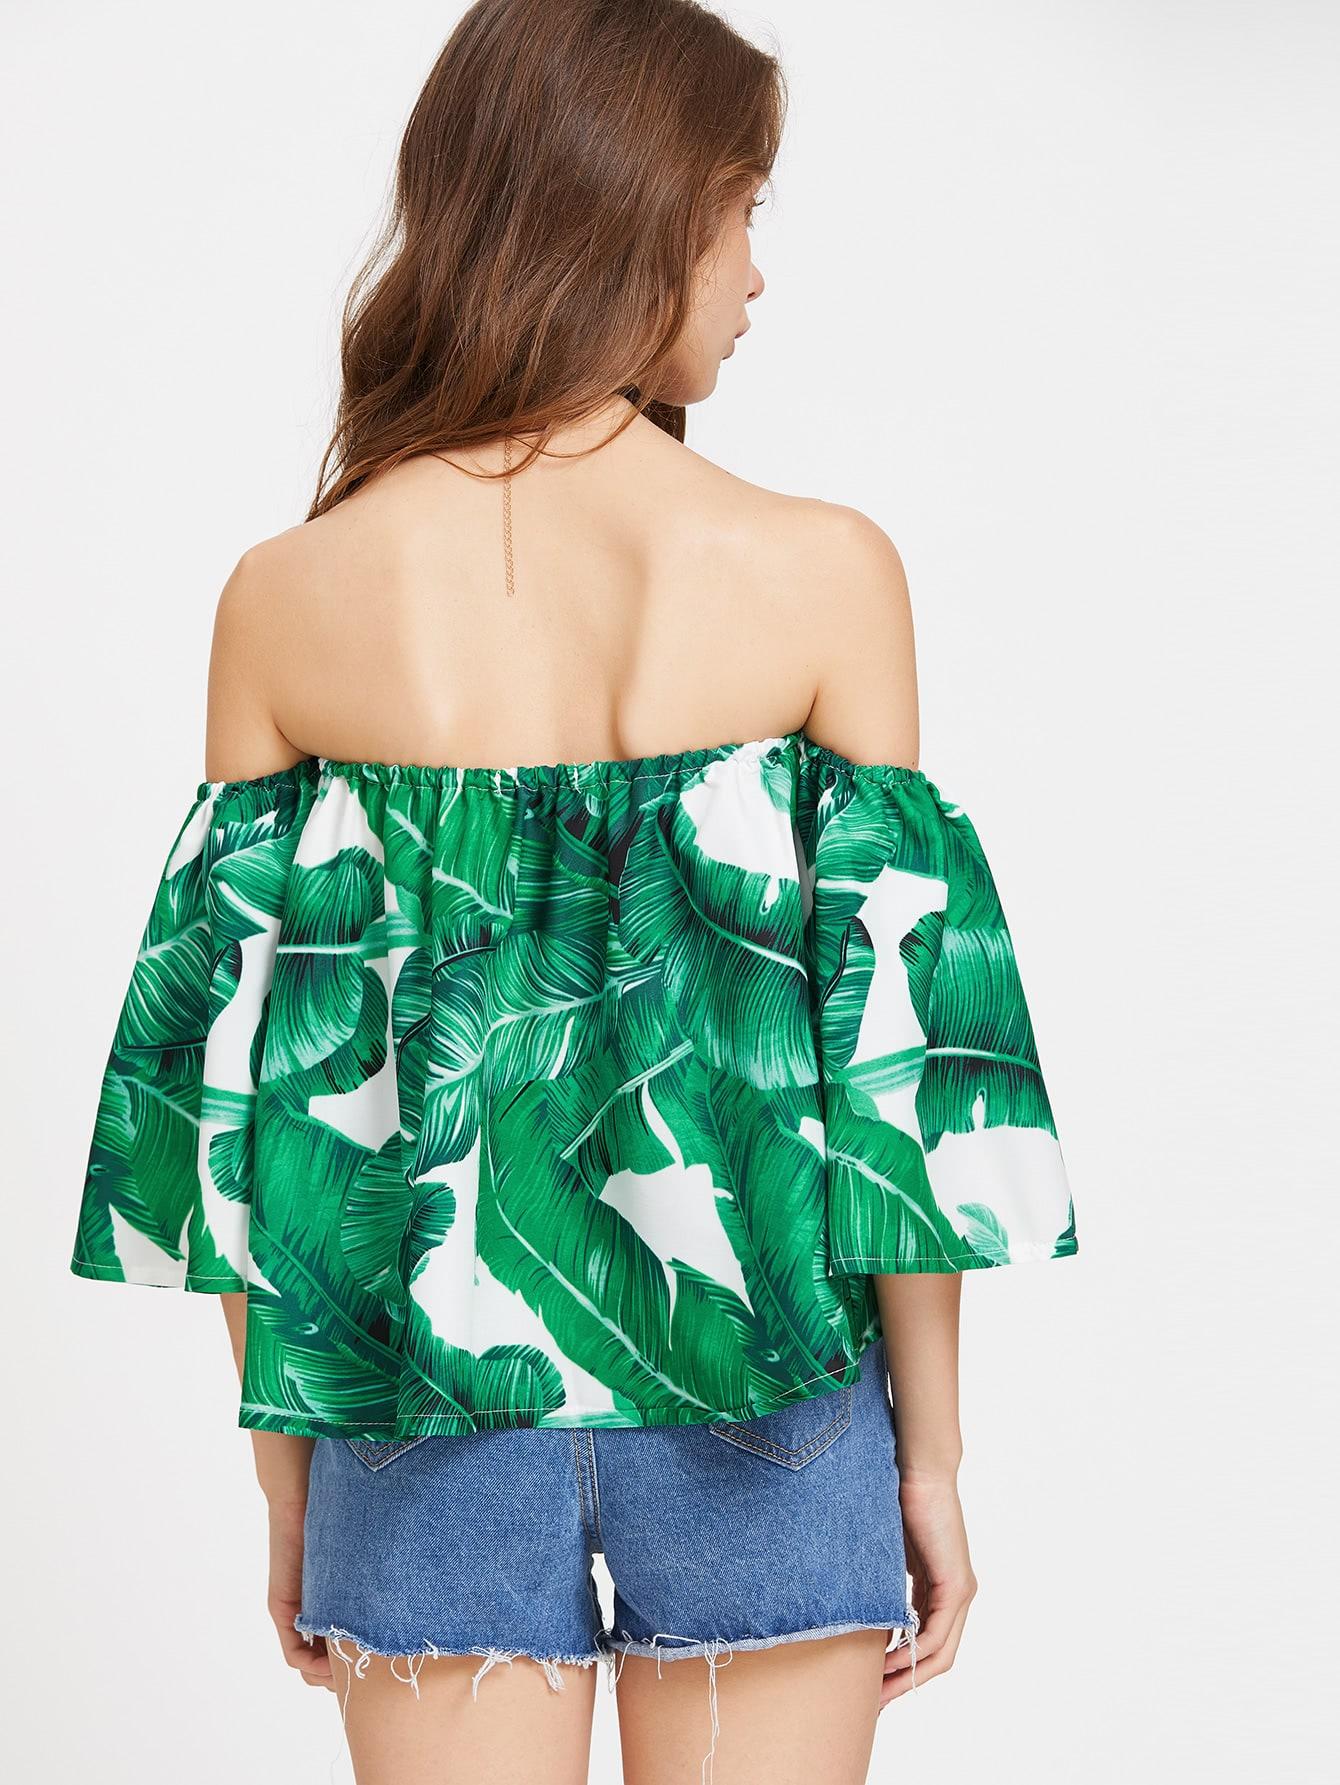 blouse170404002_2